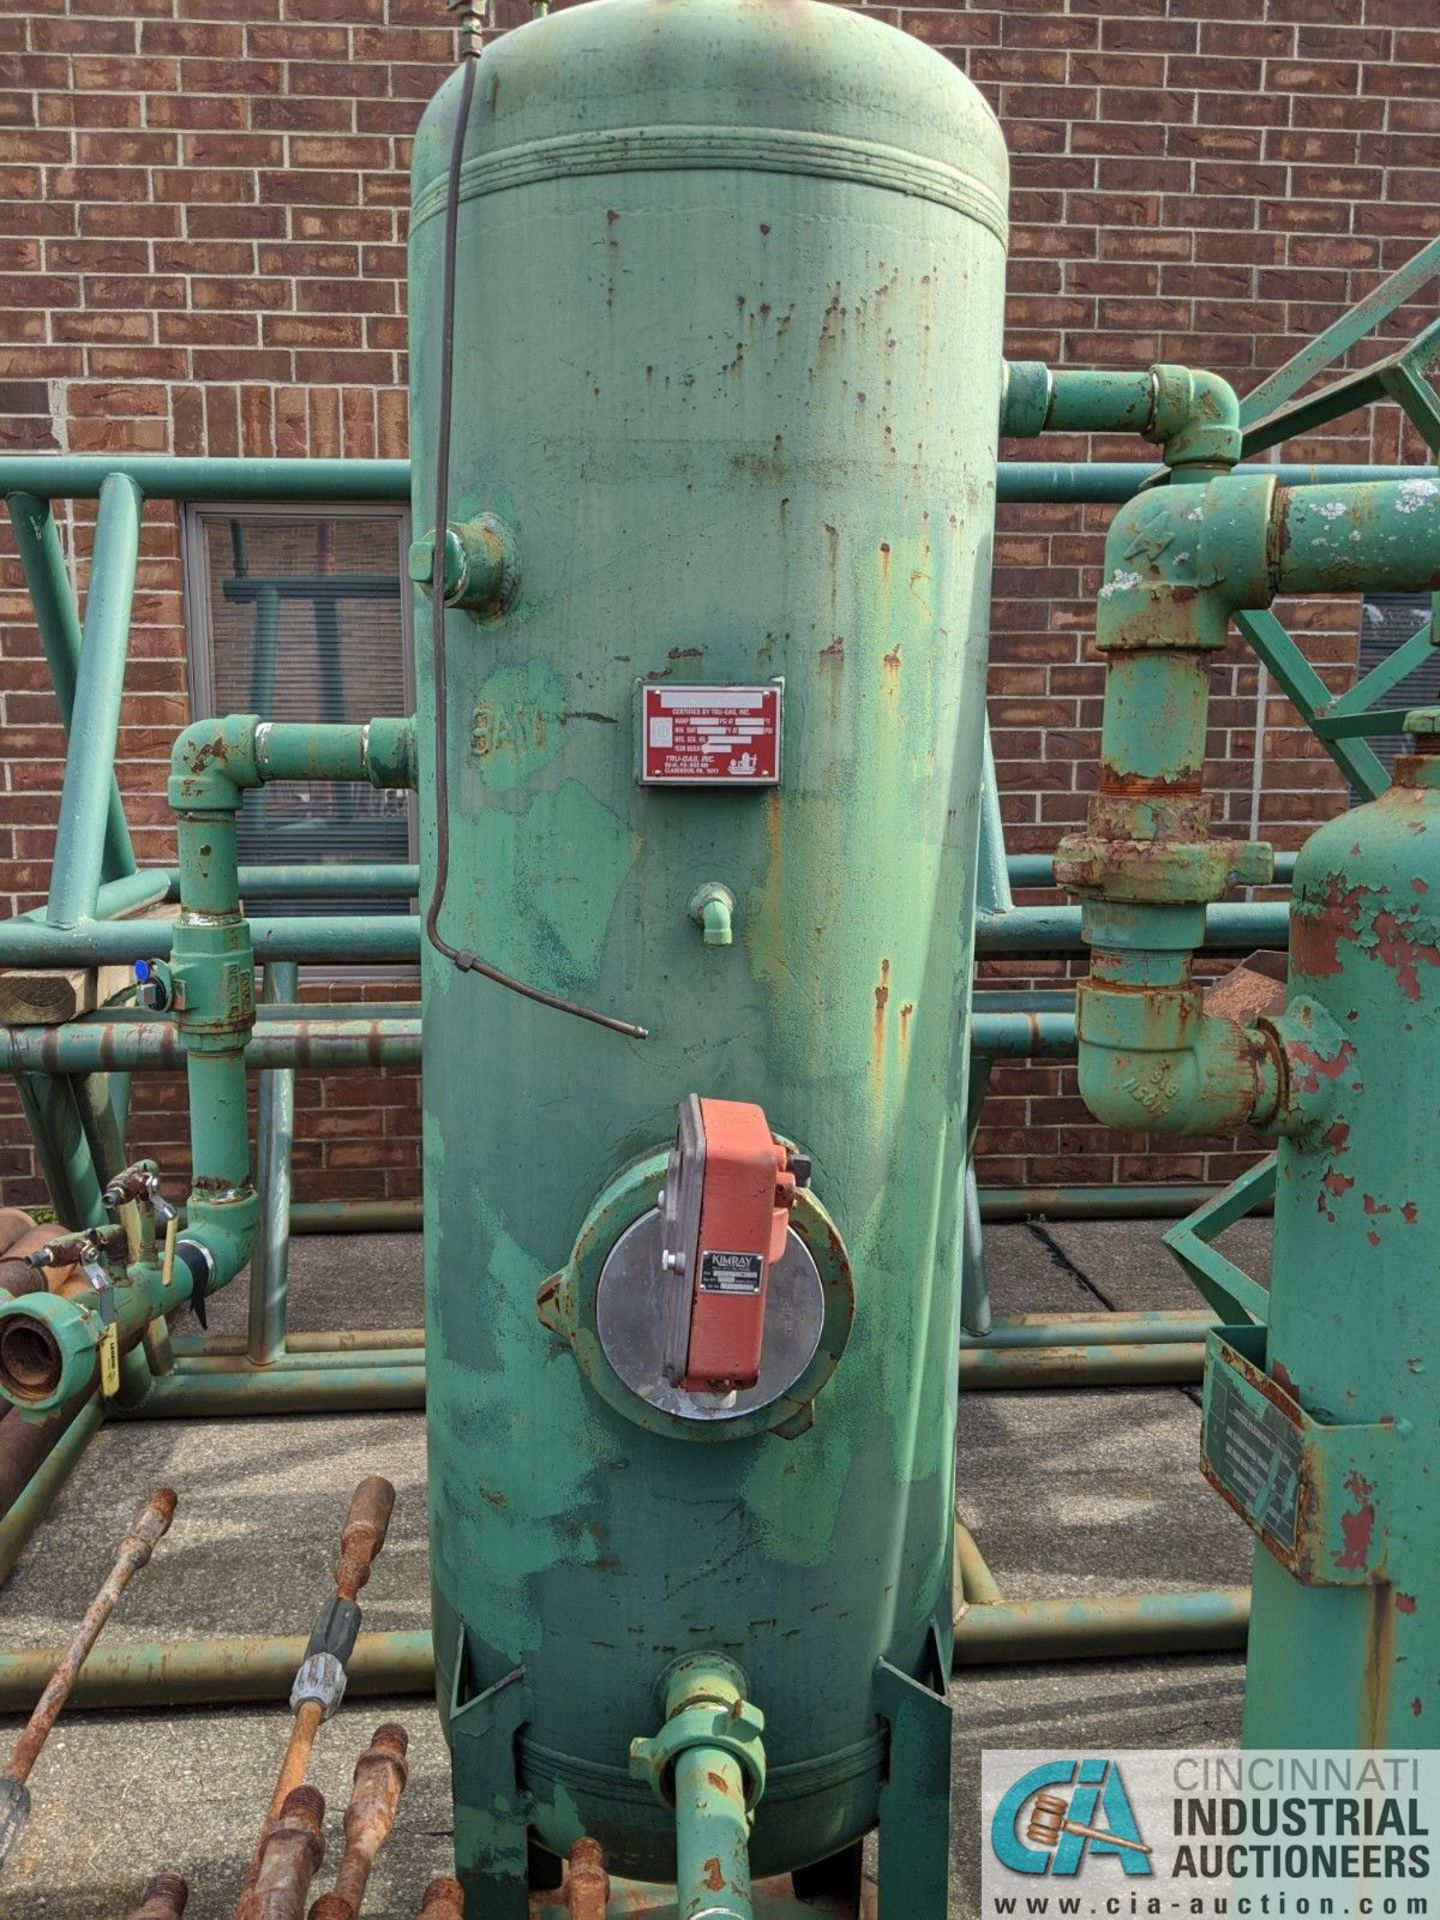 OIL / WATER SEPARATOR (8635 East Ave., Mentor, OH 44060 - John Magnasum: 440-667-9414) - Image 3 of 5